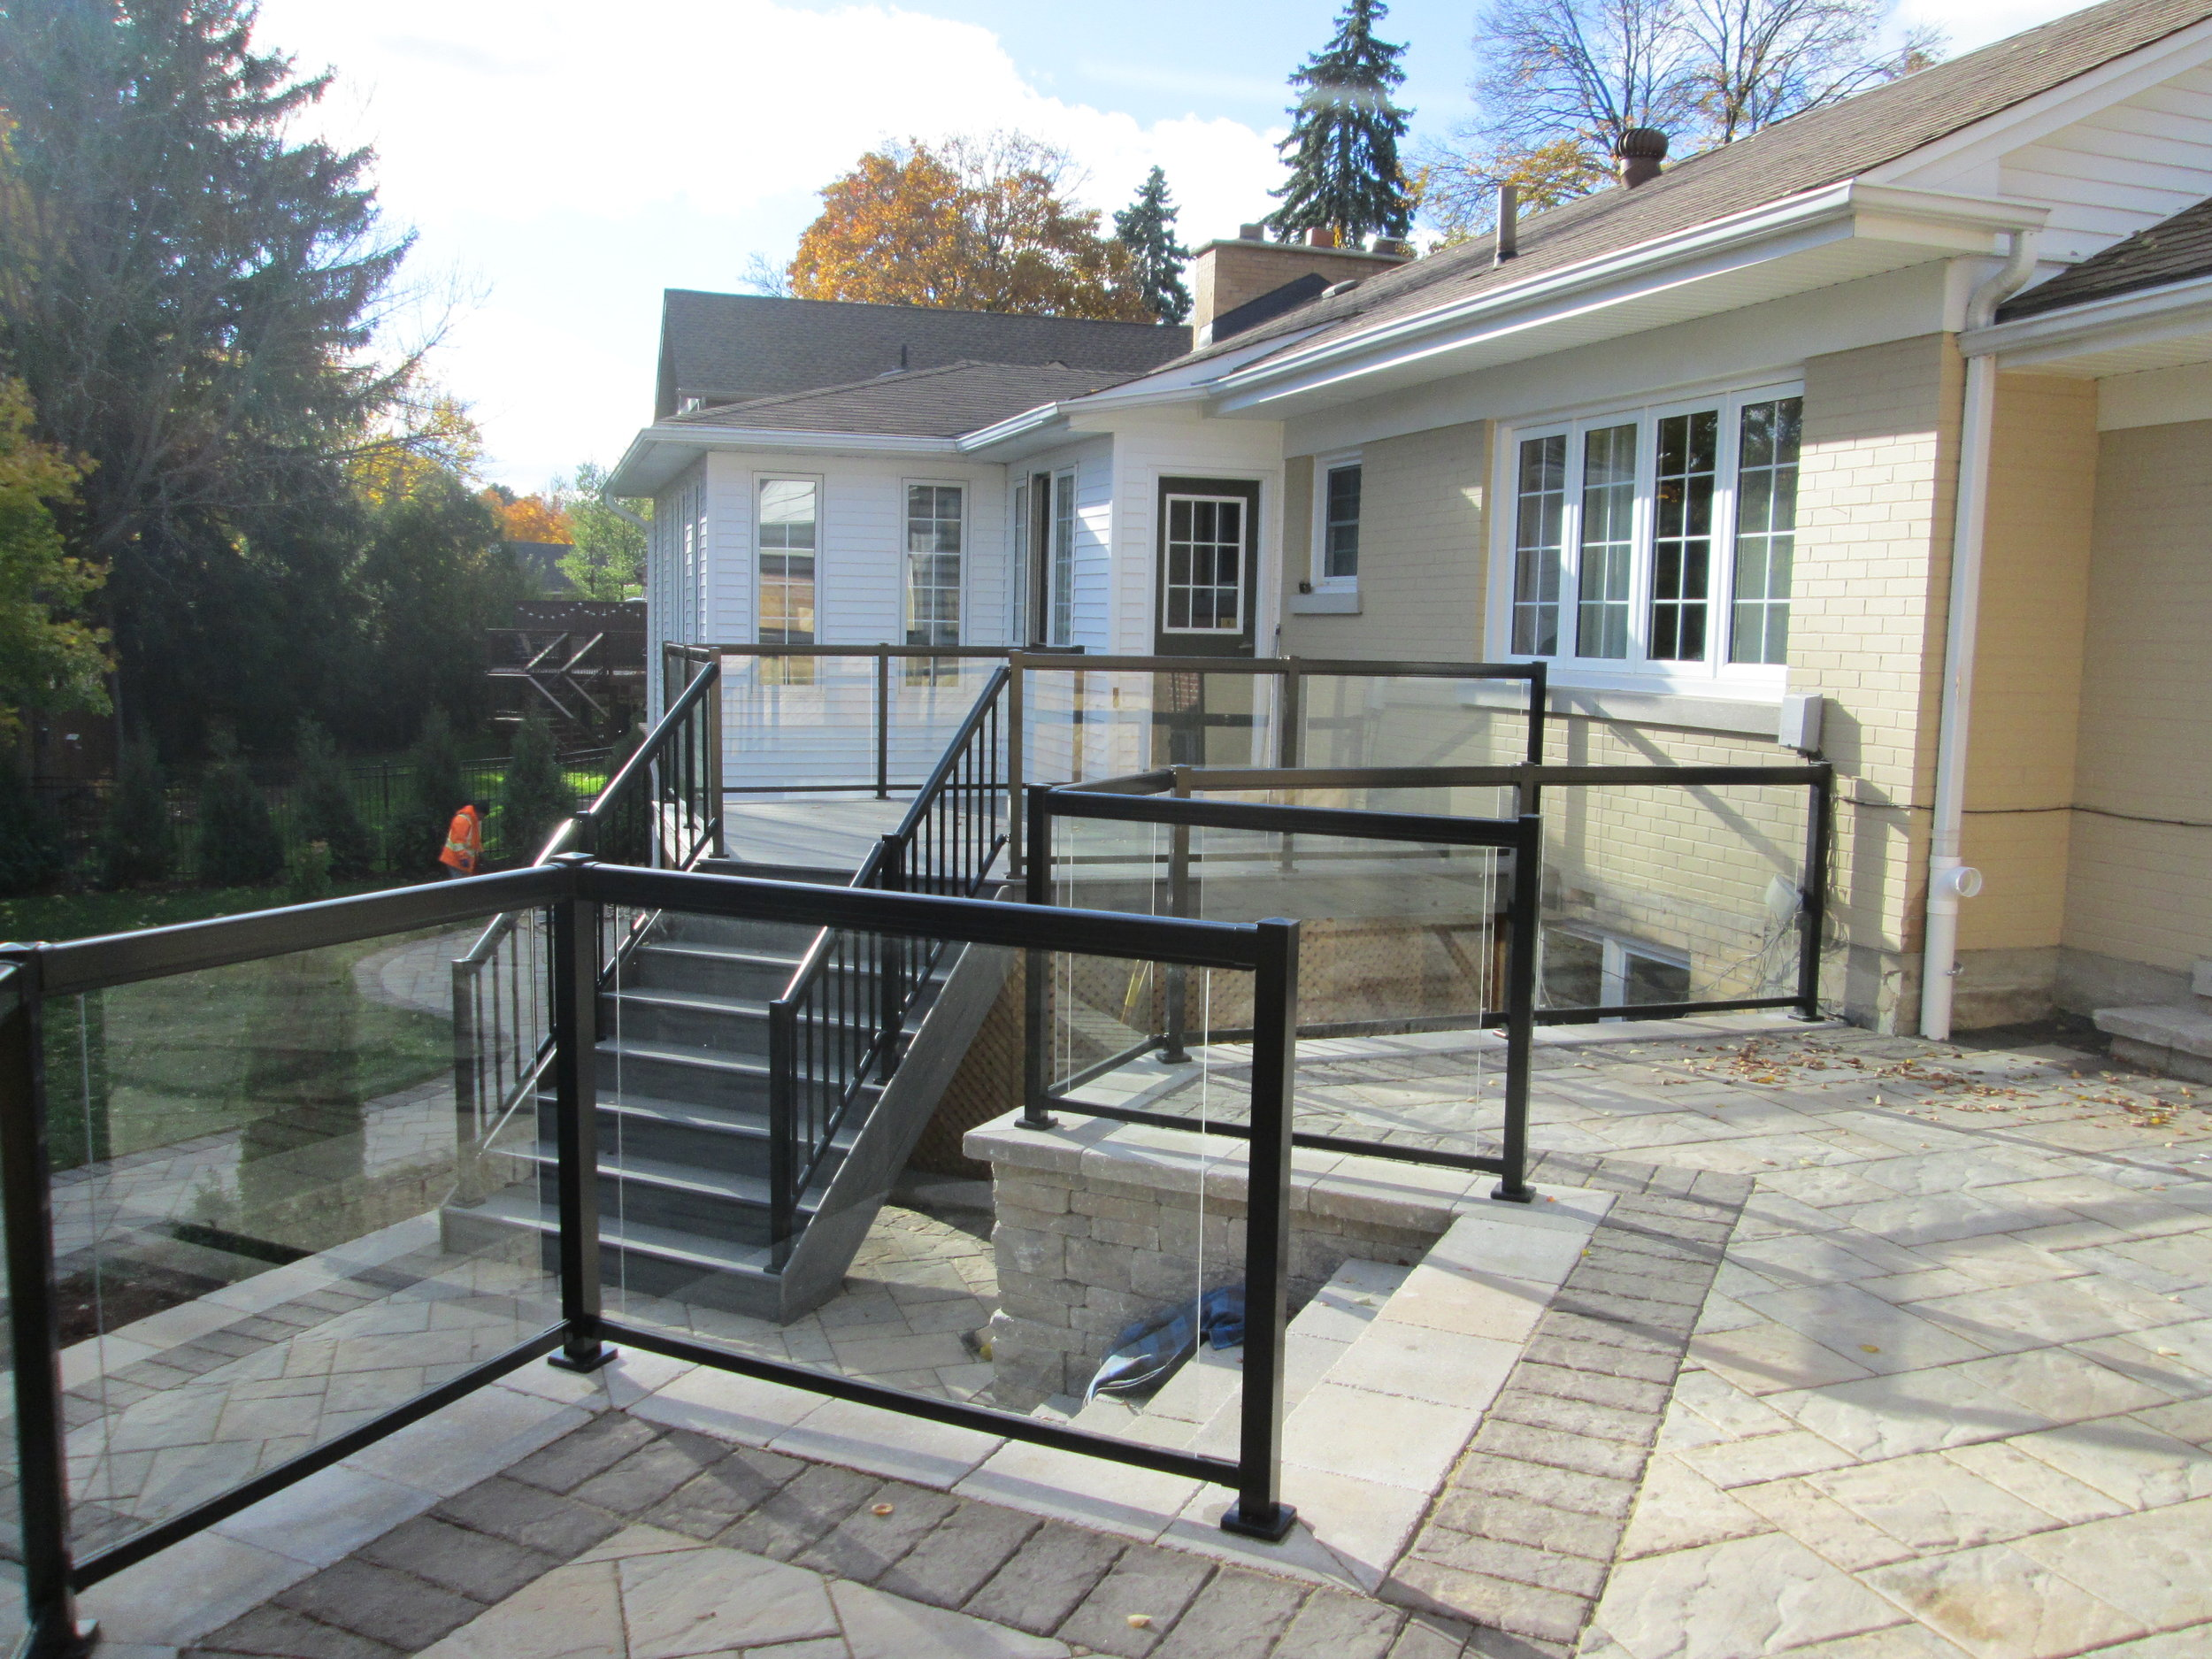 Custom steps, brick surface, and railings.